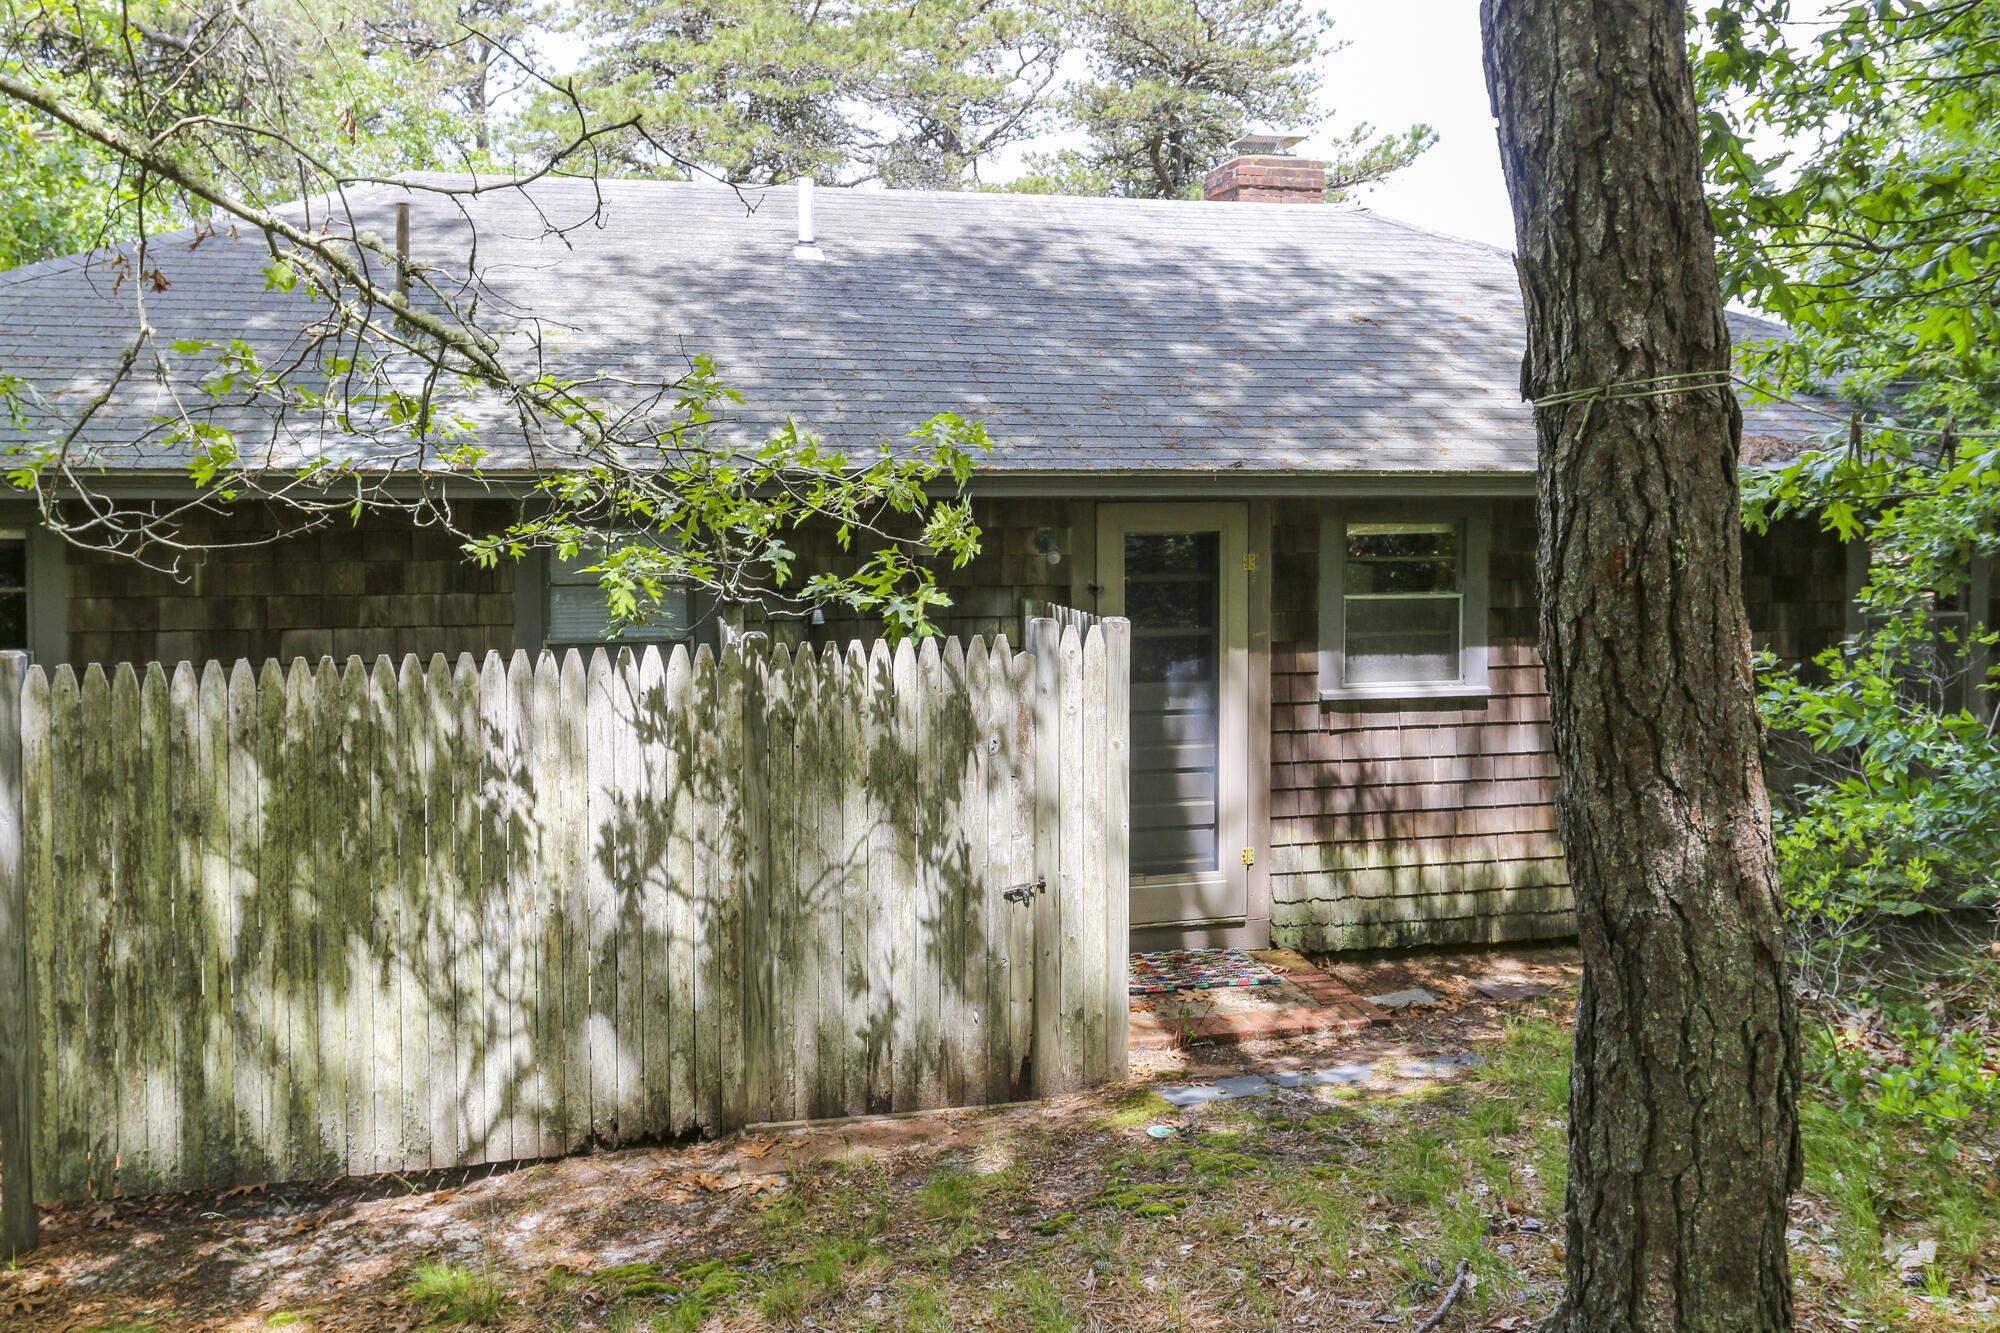 117 Bucks Creek Road, Chatham MA, 02633 - slide 7